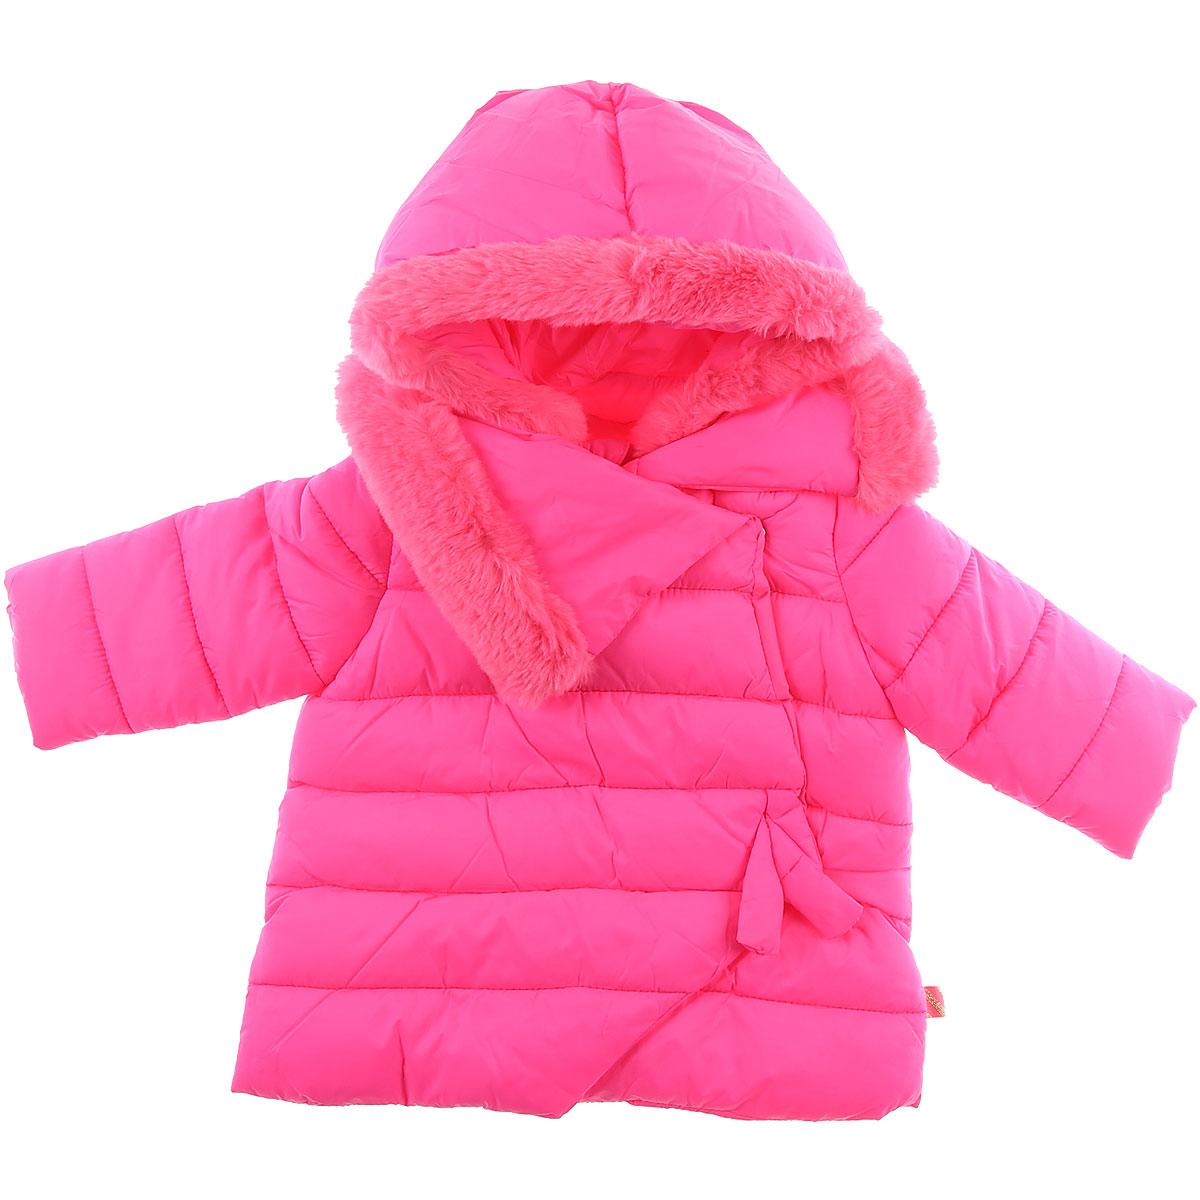 Image of Billieblush Girls Down Jacket for Kids, Puffer Ski Jacket, Fluo Pink, polyamide, 2017, 2Y 3Y